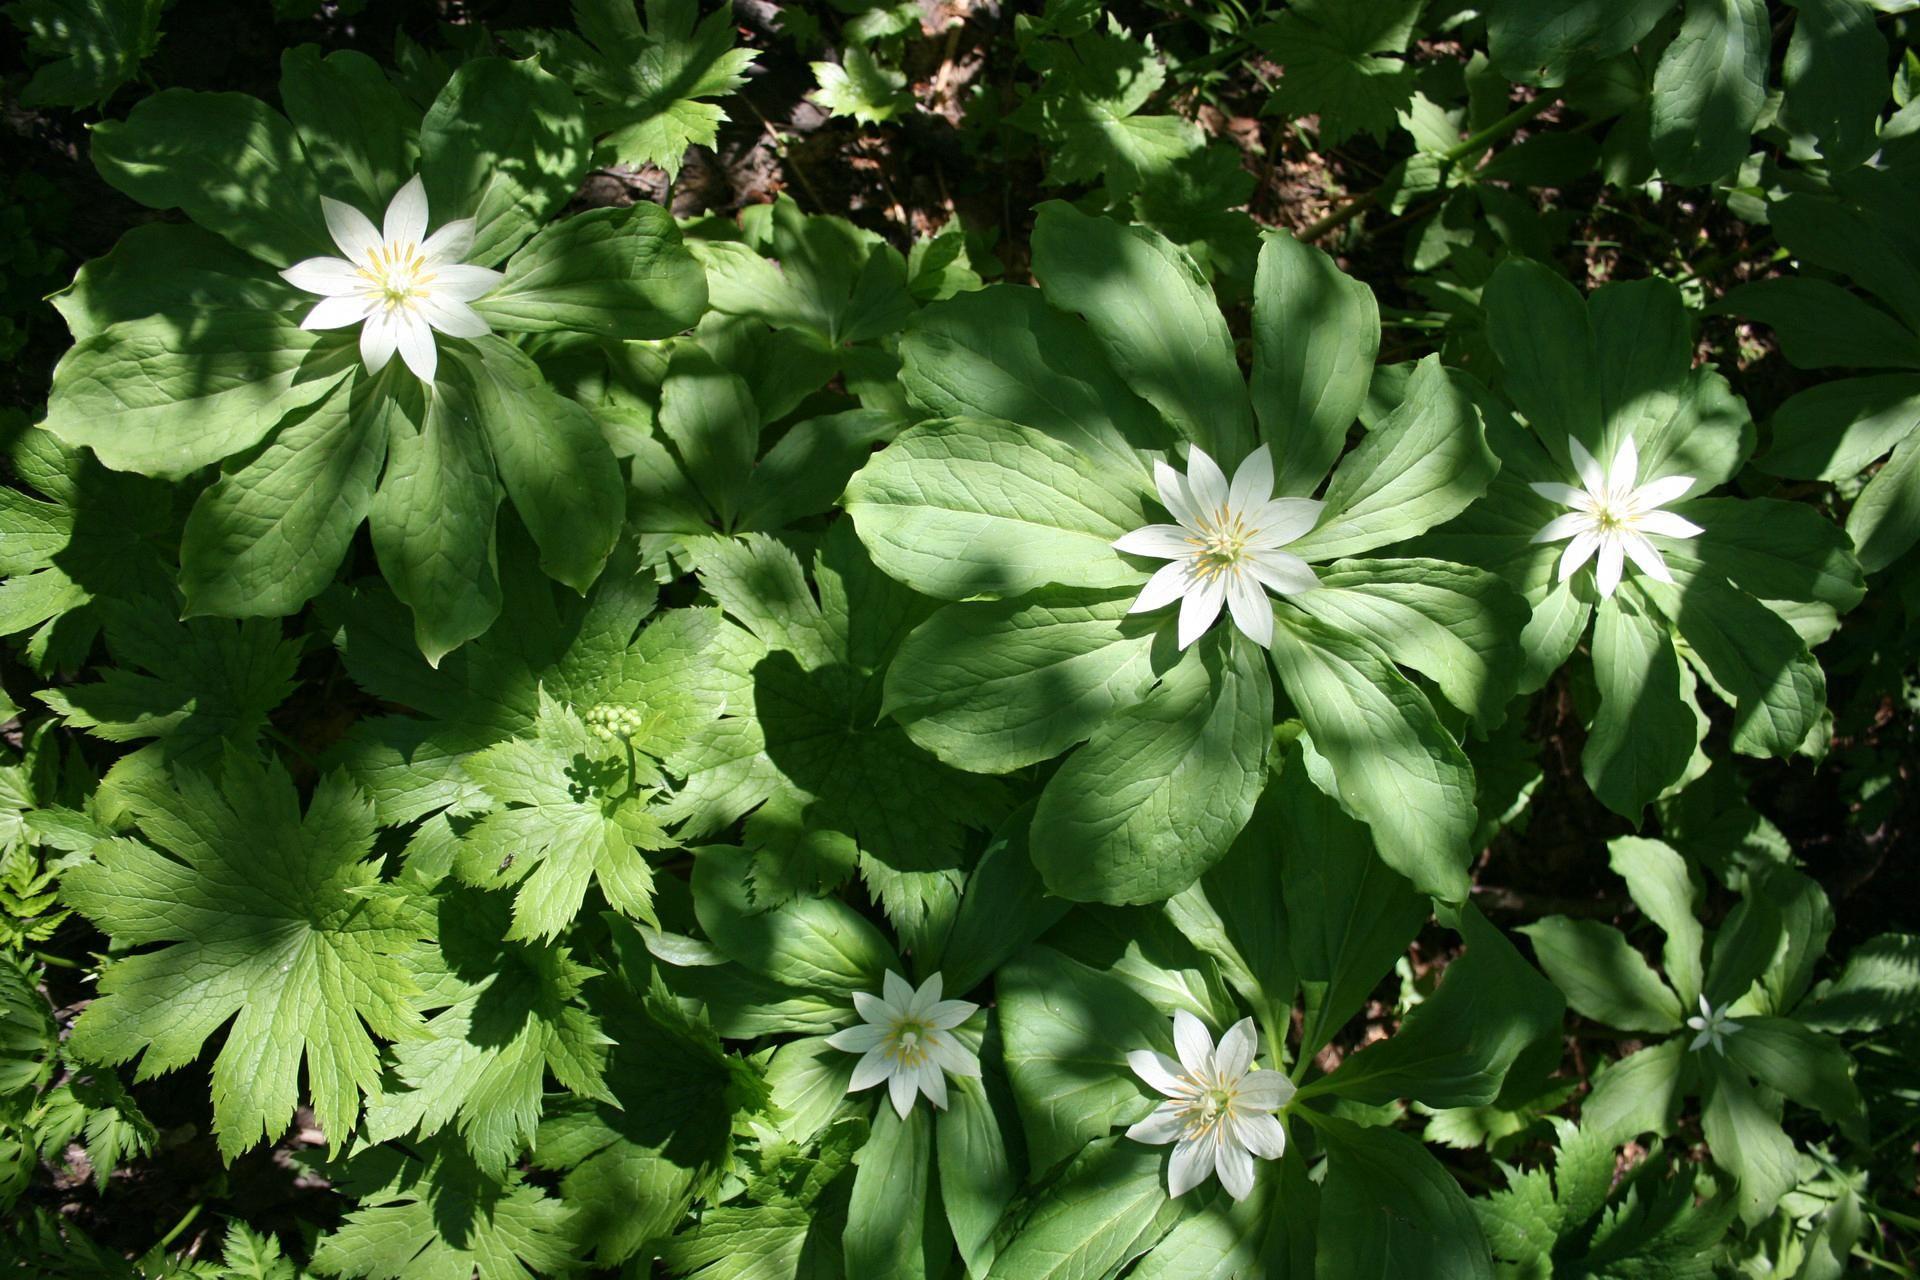 Planting Seeds Worksheets Quotesaboutplantingseedsforlife